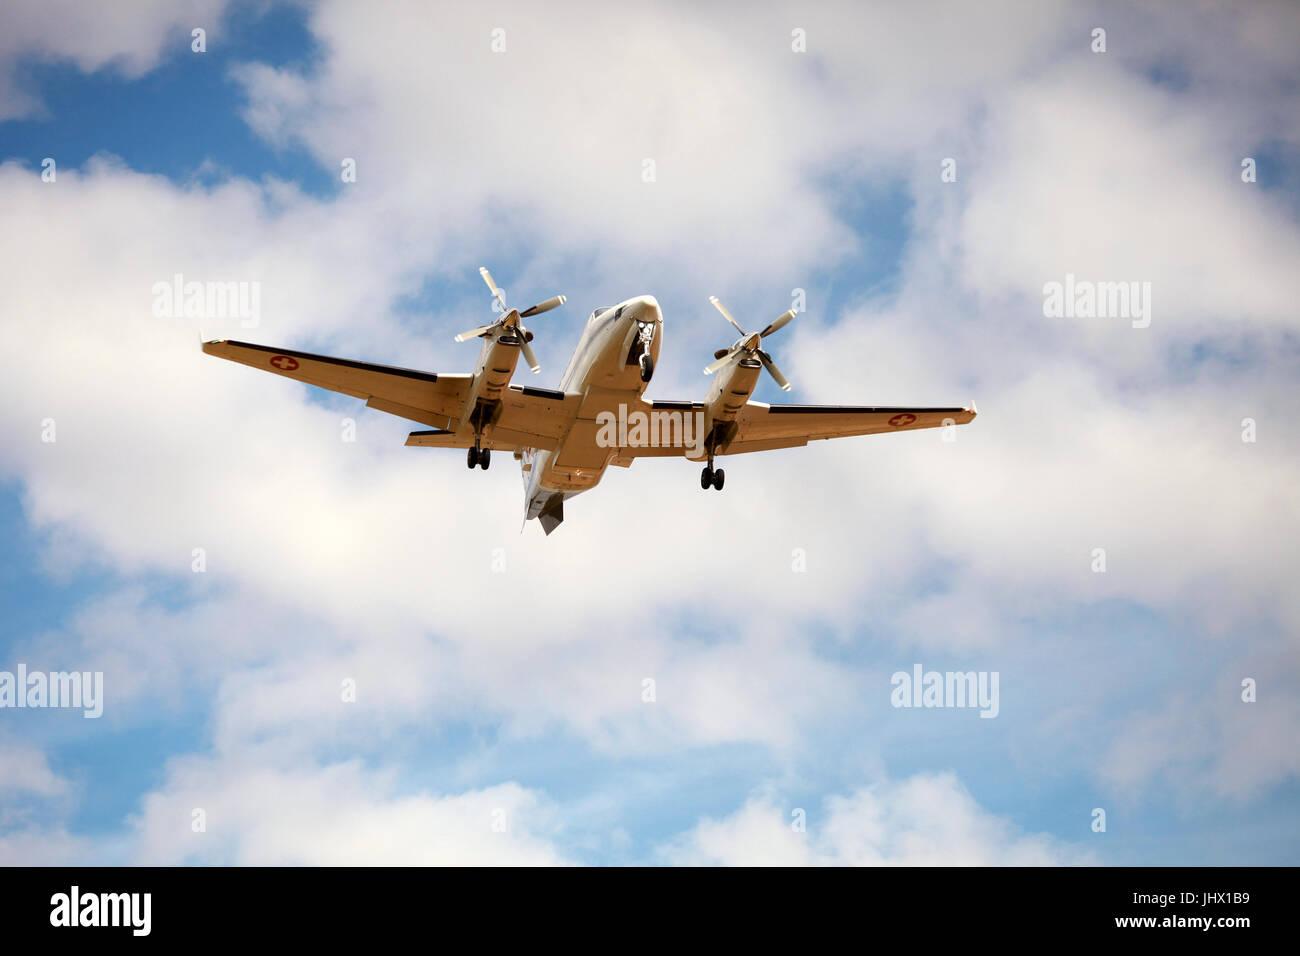 small passenger aircraft landing - Stock Image